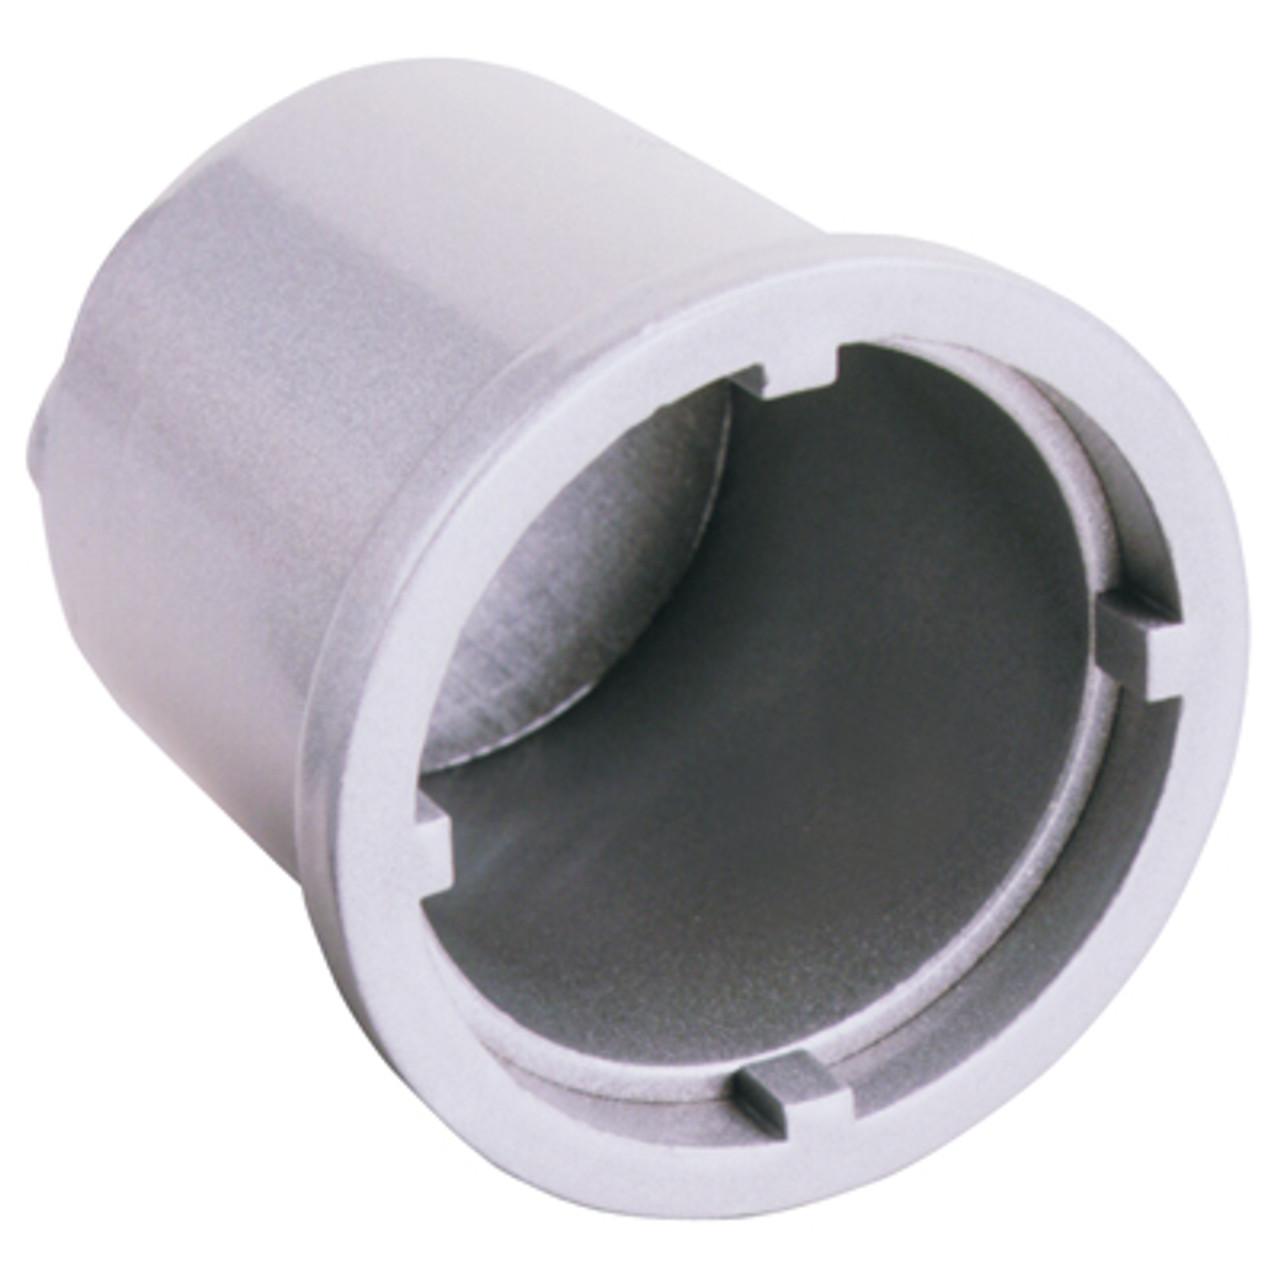 Spanner Locknut OTC 7158 Wrench